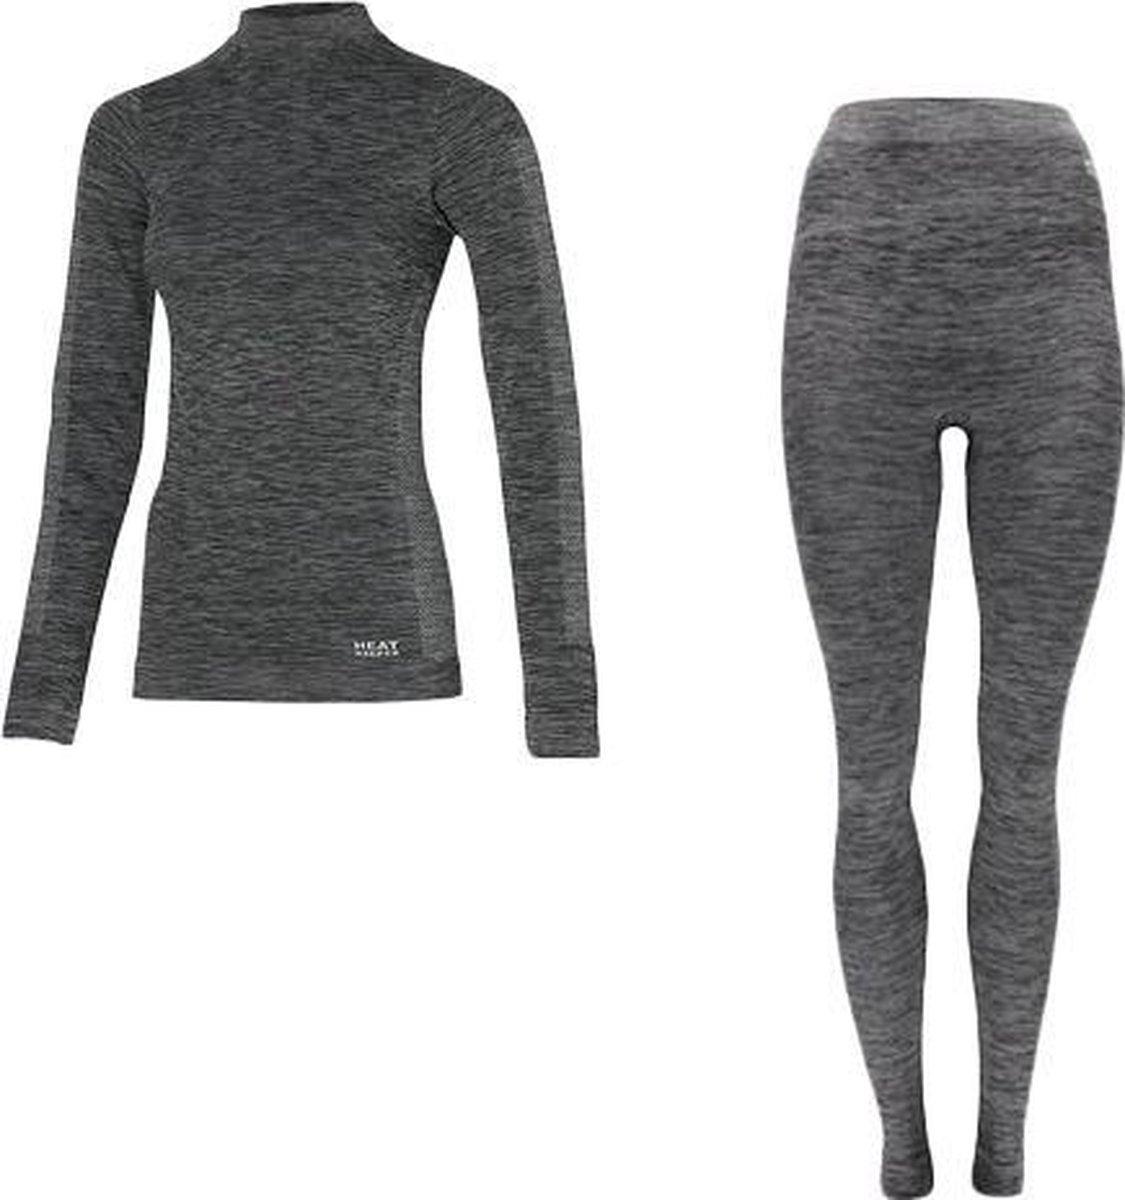 Premium thermokleding - Type: Dames, maat M - Broek en shirt - Thermoset